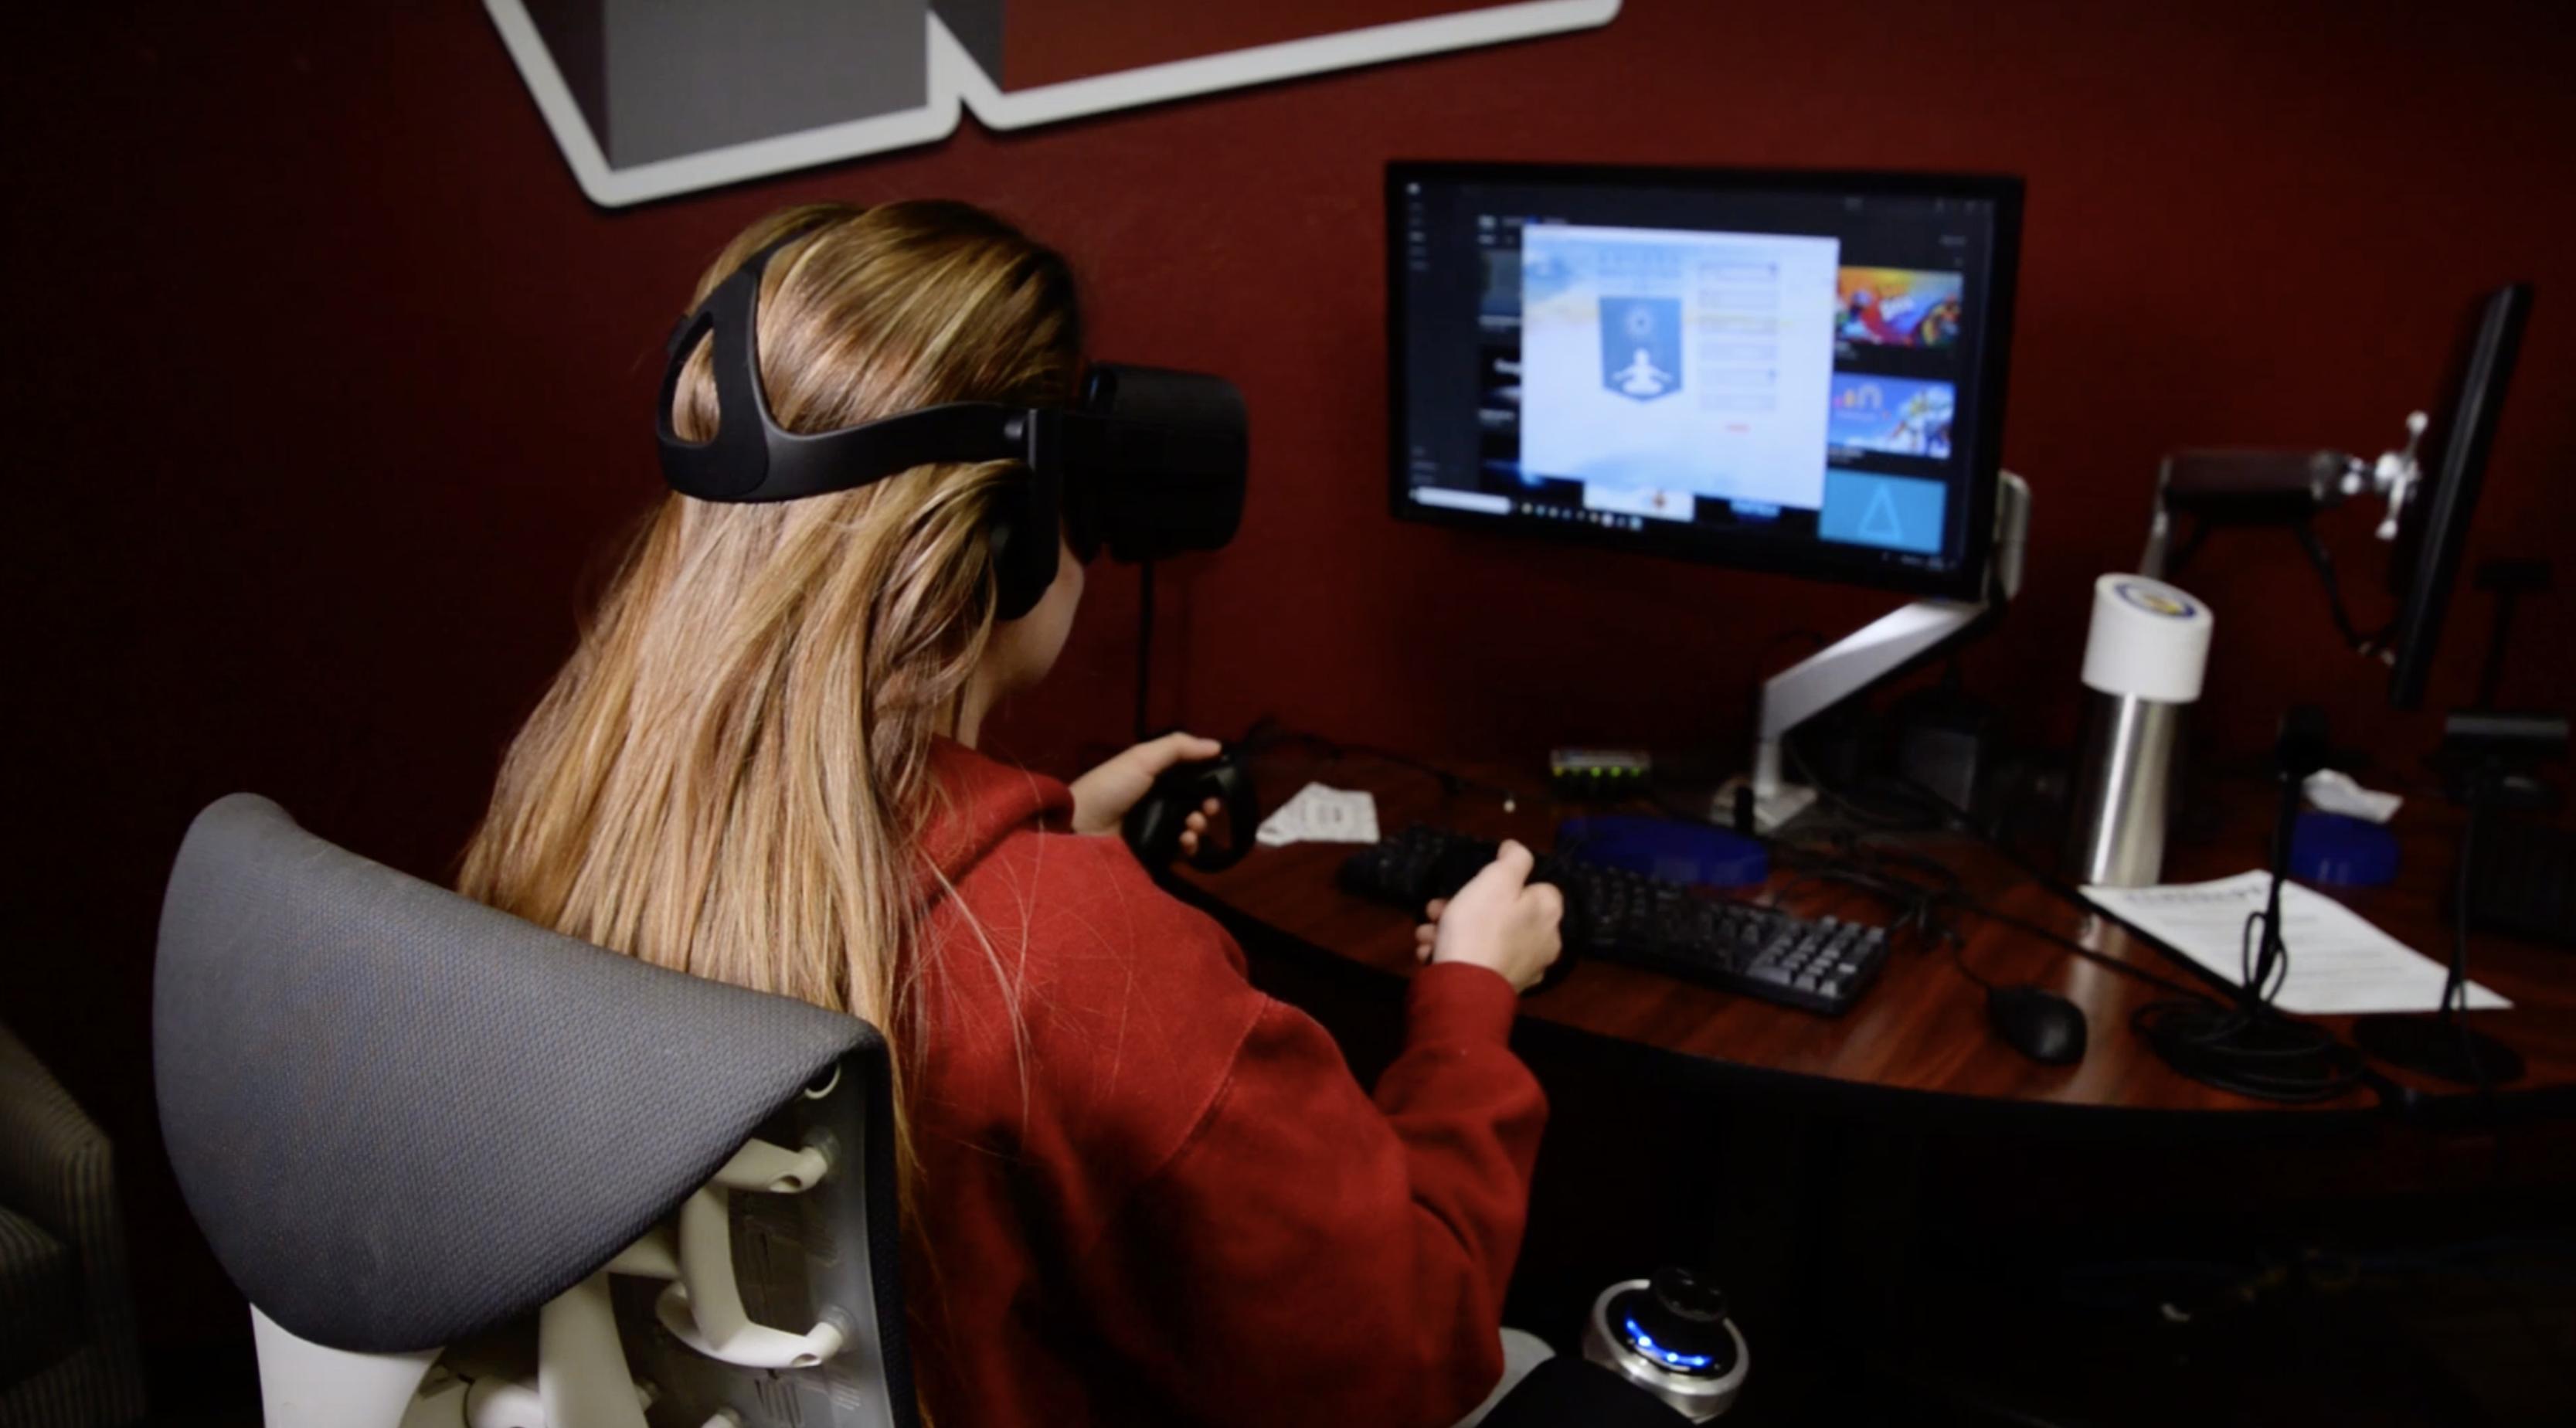 Finals Week VR Guided Meditation